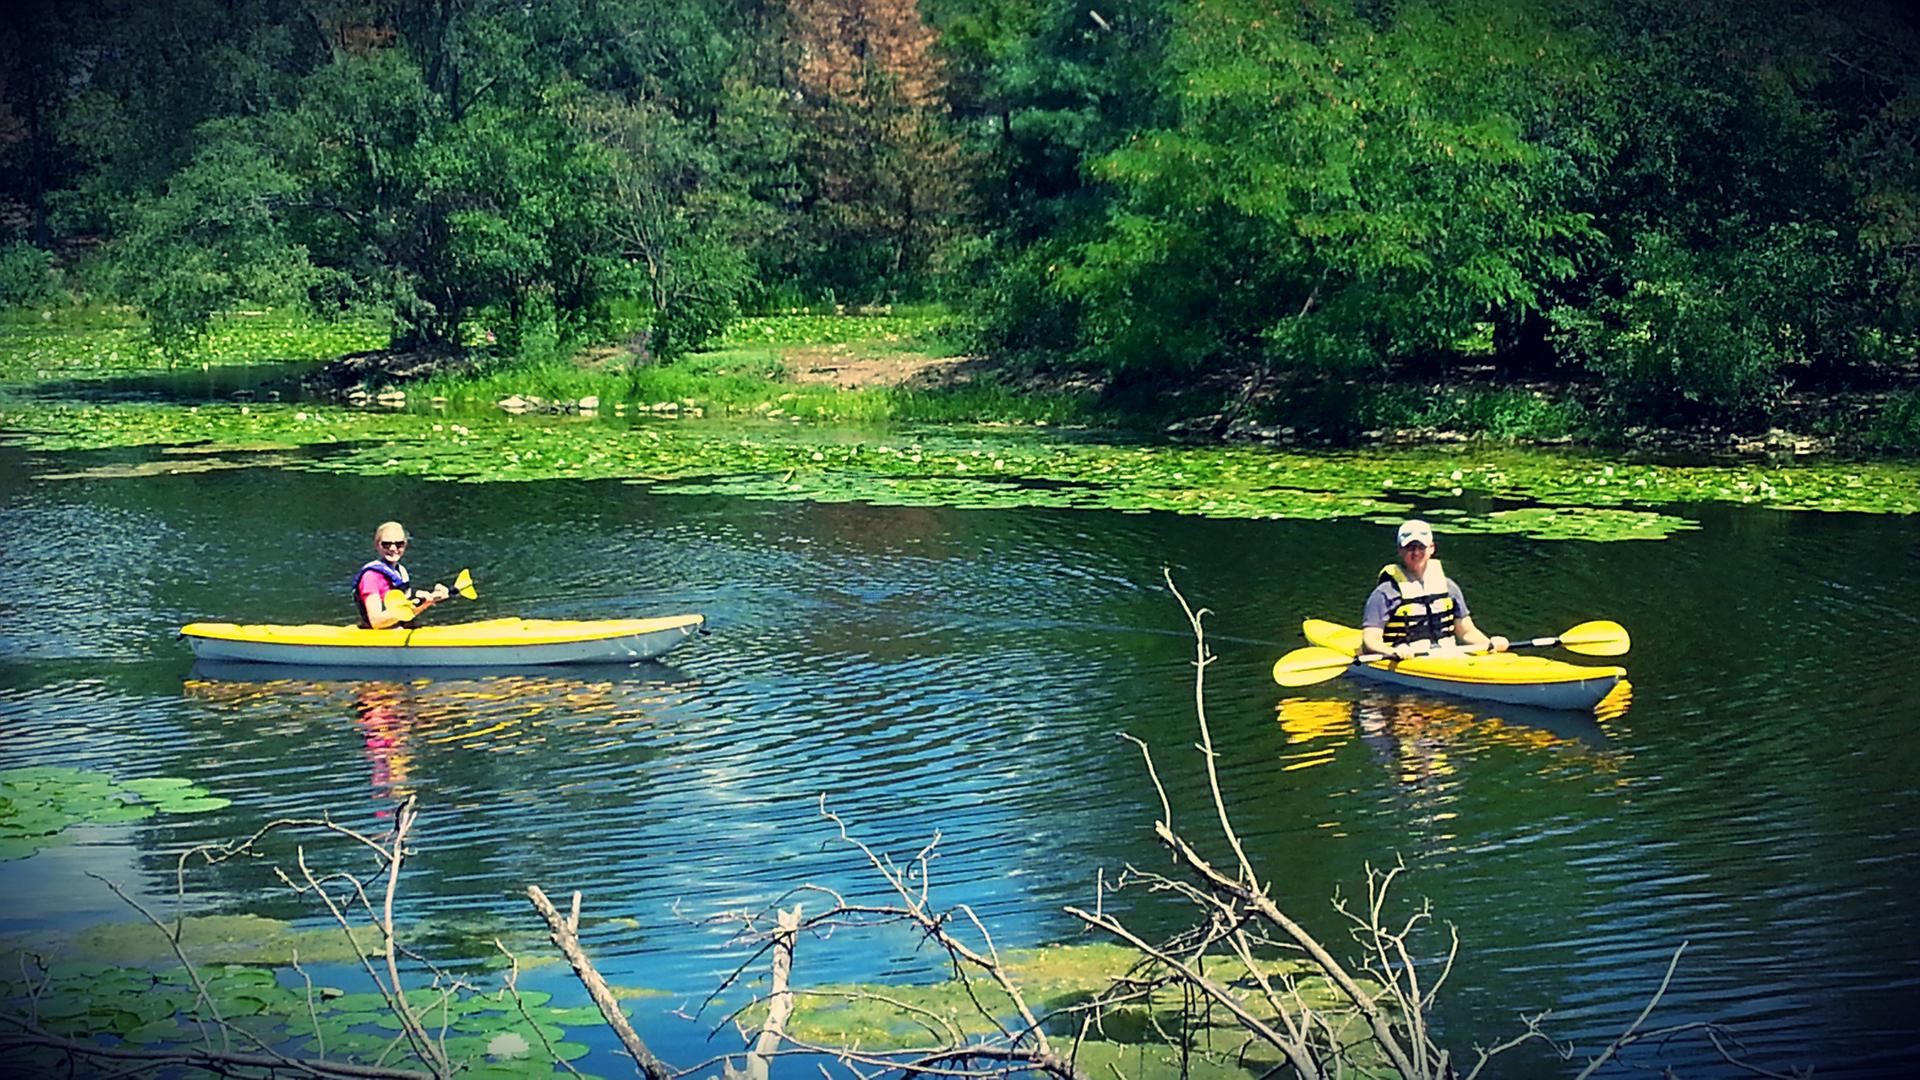 Lake katherine nature center botanic gardens enjoy - The wedding garden carbondale il ...